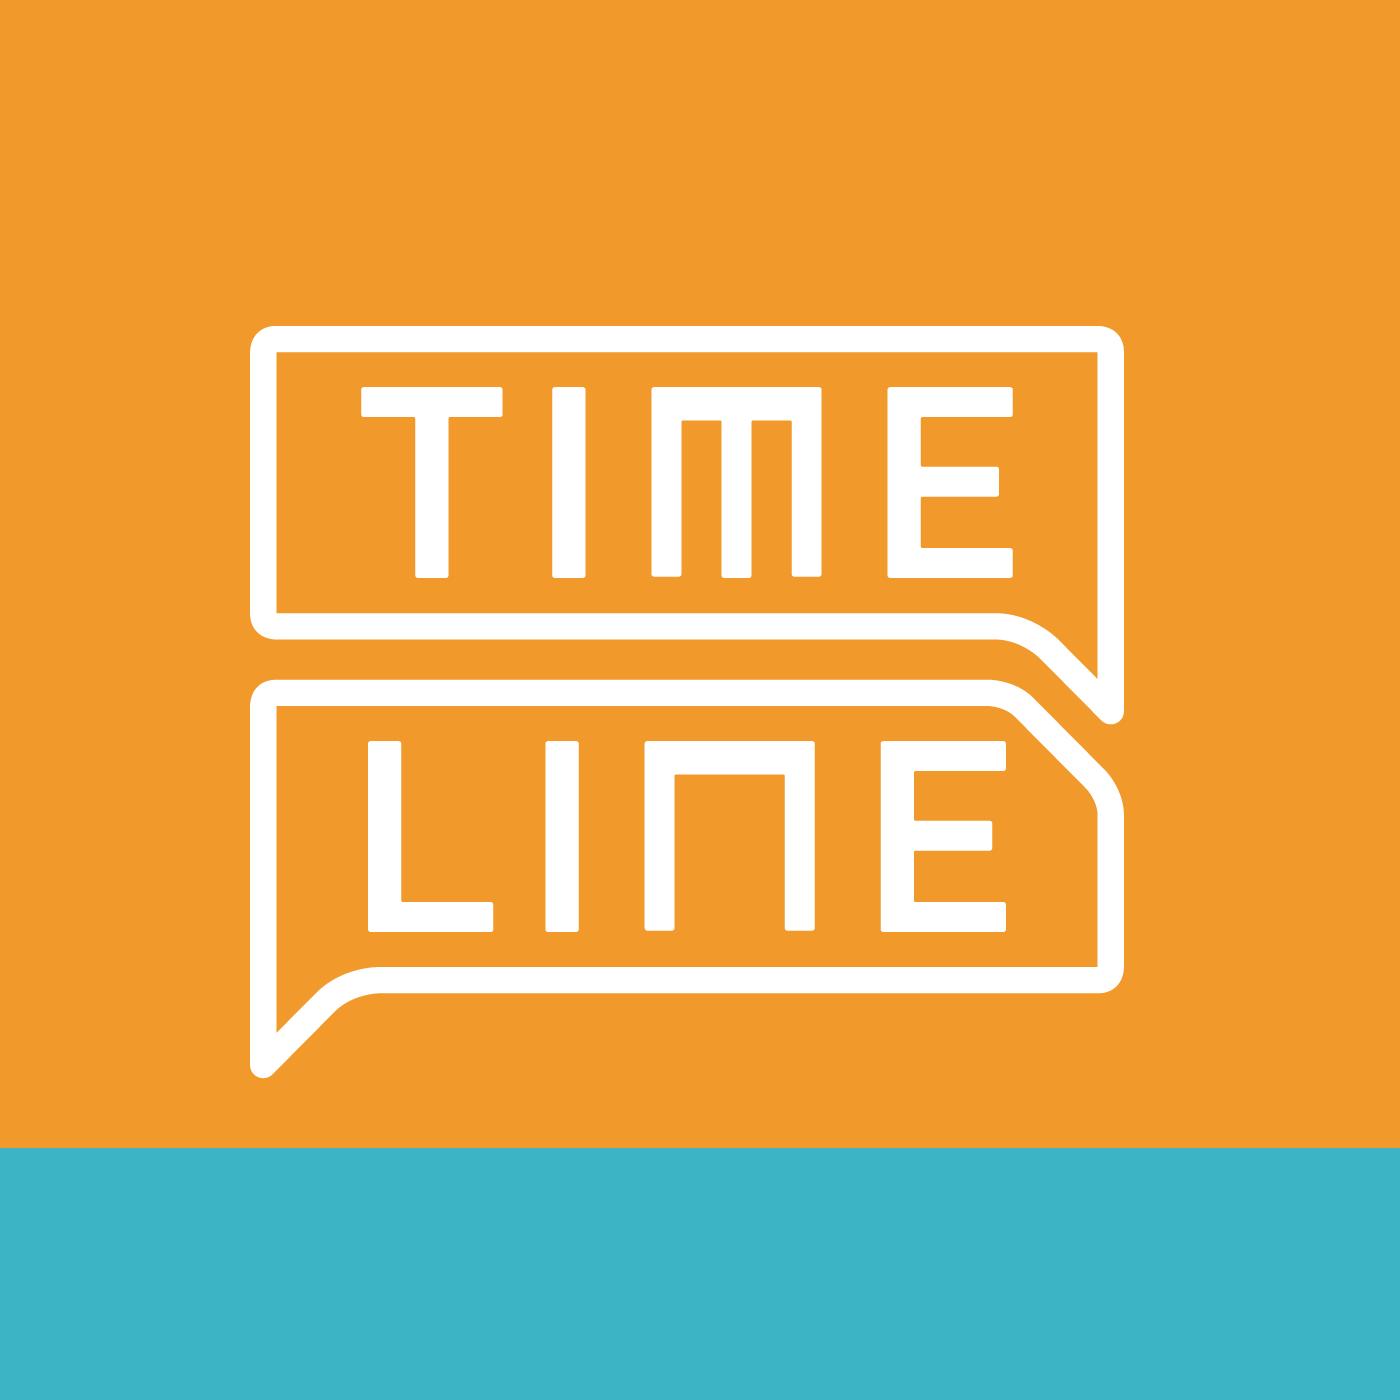 Timeline Gaúcha 24/07/2017